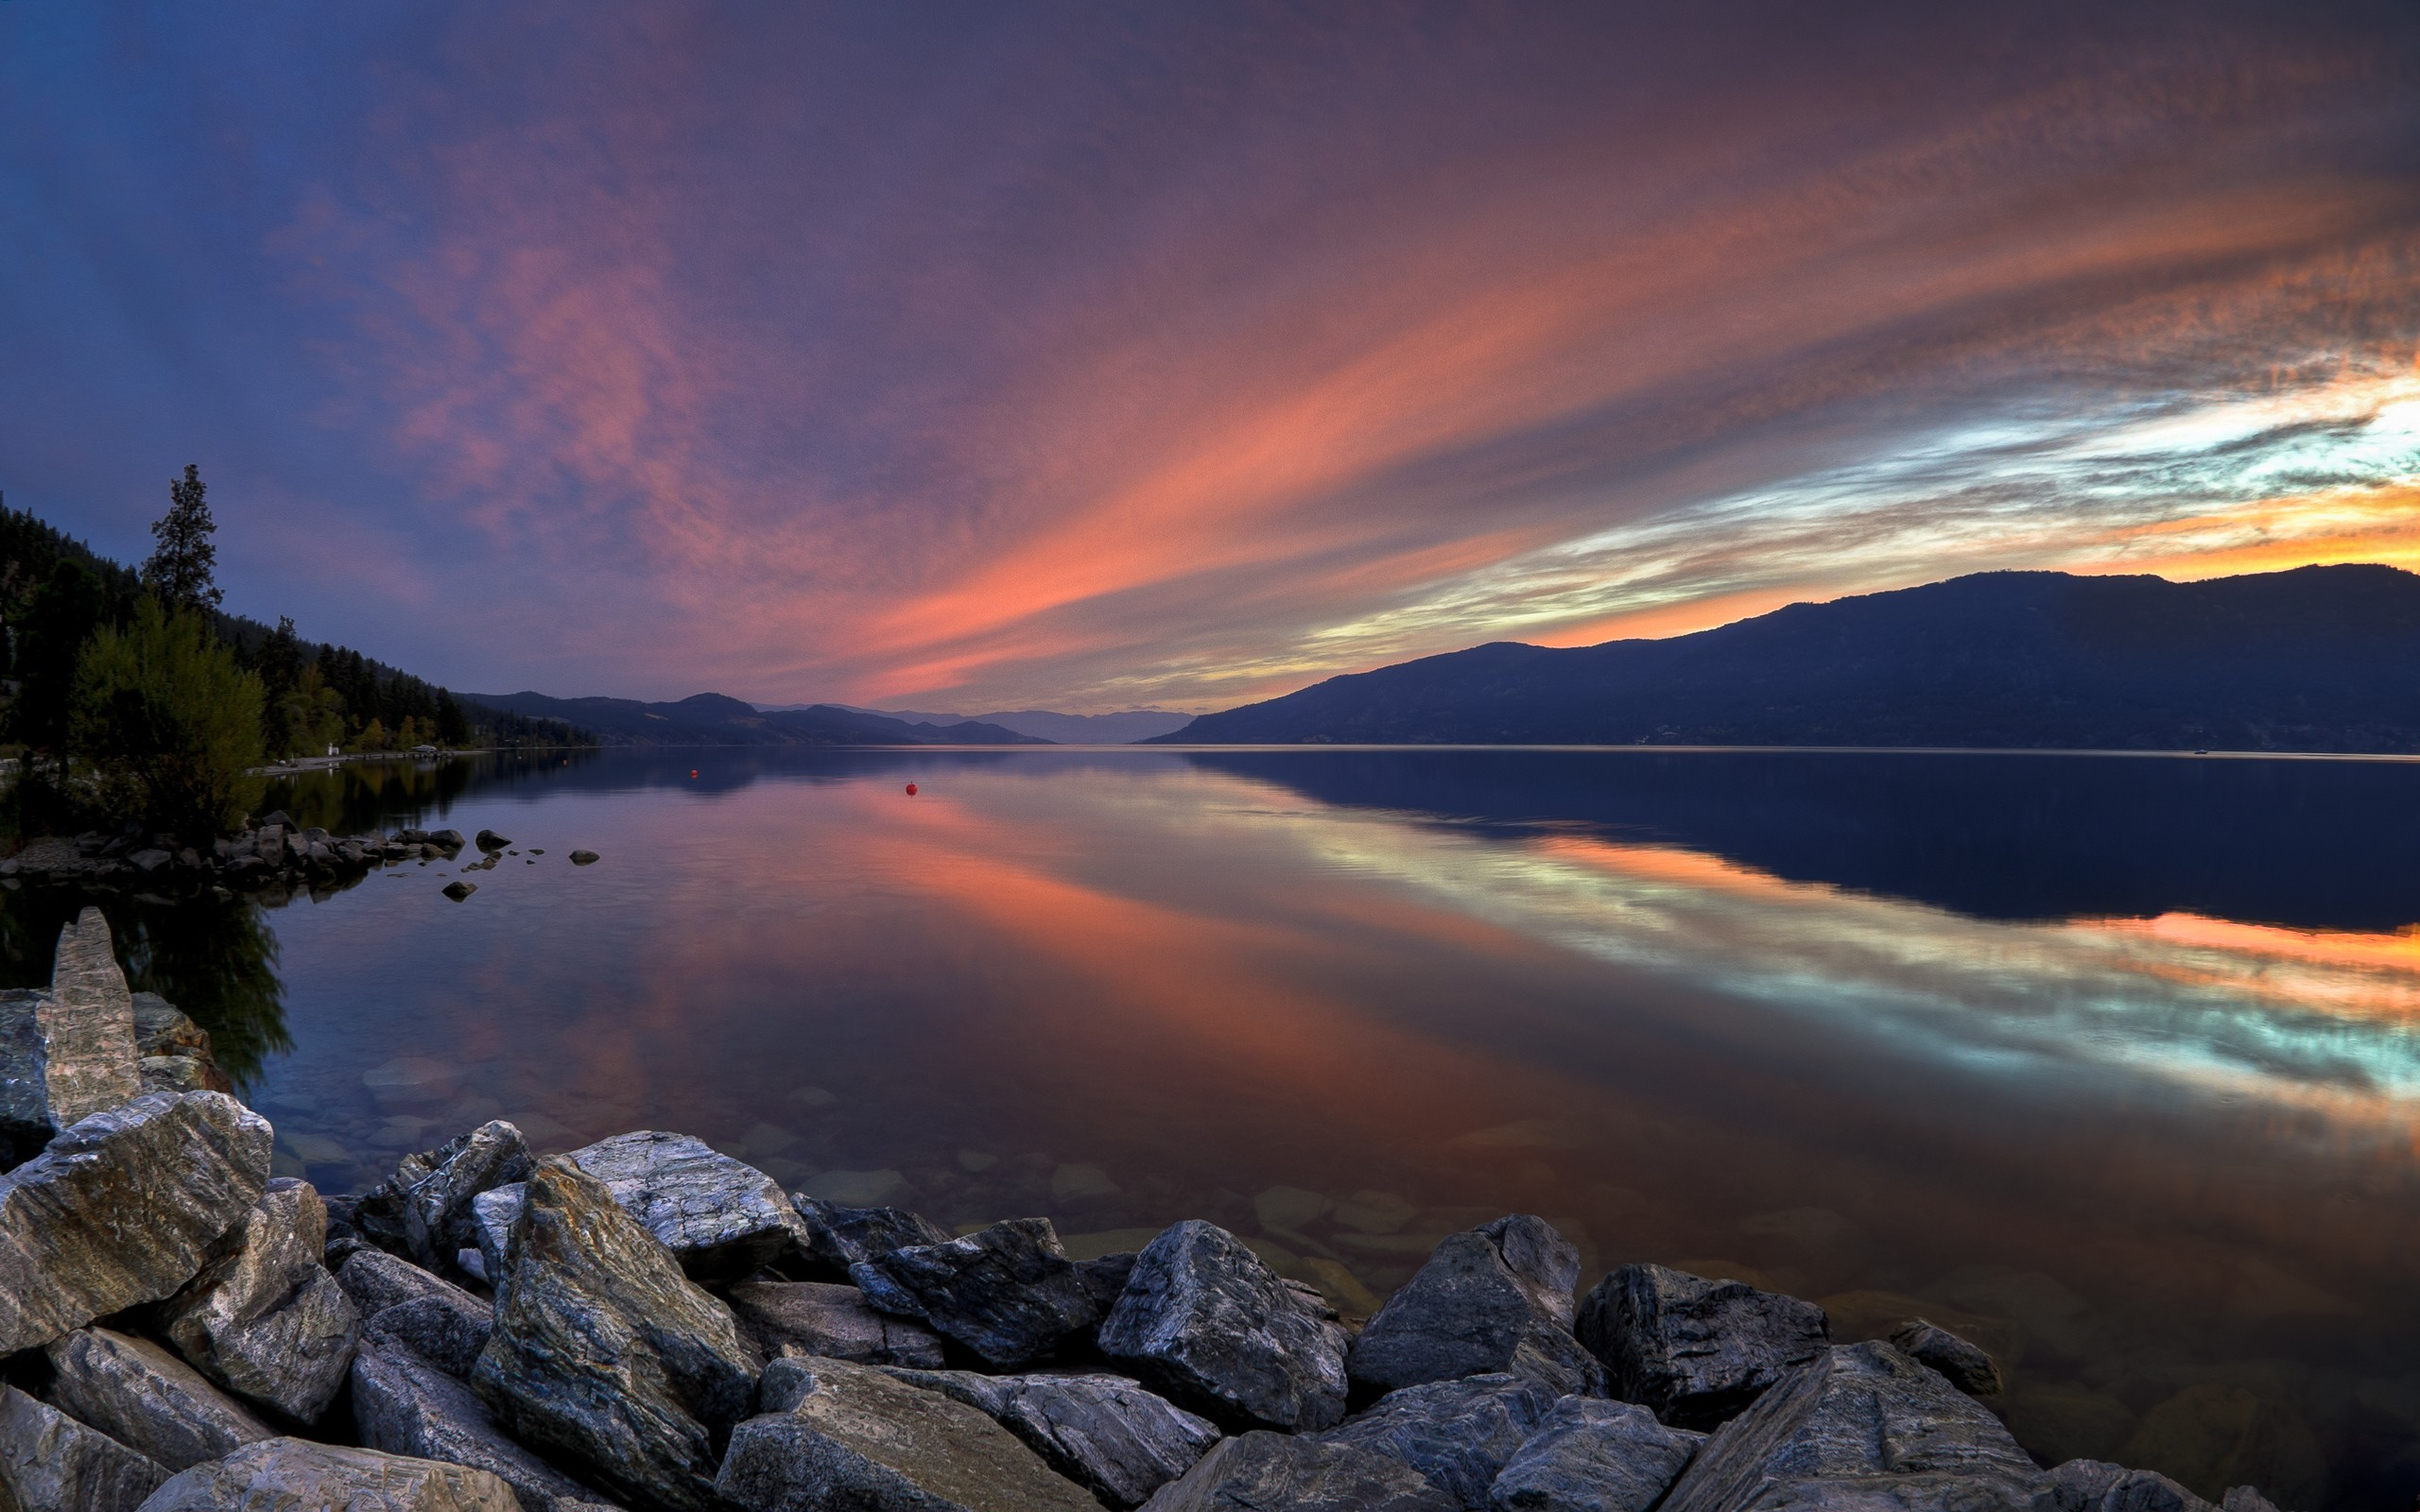 Paisajes de lagos - 2560x1600